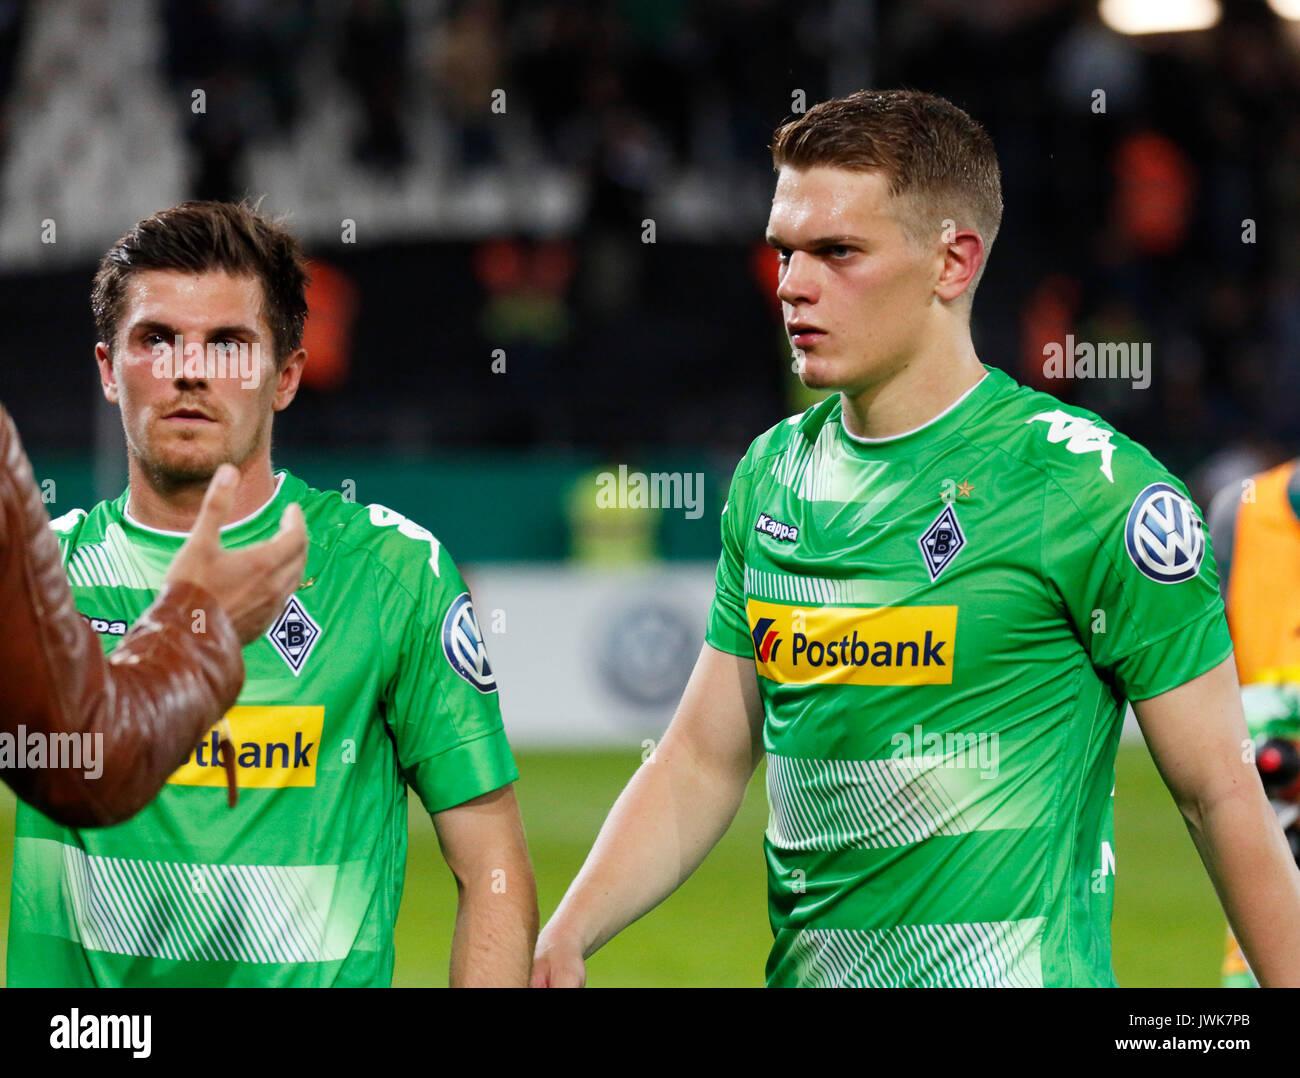 sports, football, DFB Cup, 2017/2018, Round 1, Rot Weiss Essen vs Borussia Moenchengladbach 1:2, Stadium Essen, leaving, Matthias Ginter (MG) right and Jonas Hofmann (MG) - Stock Image